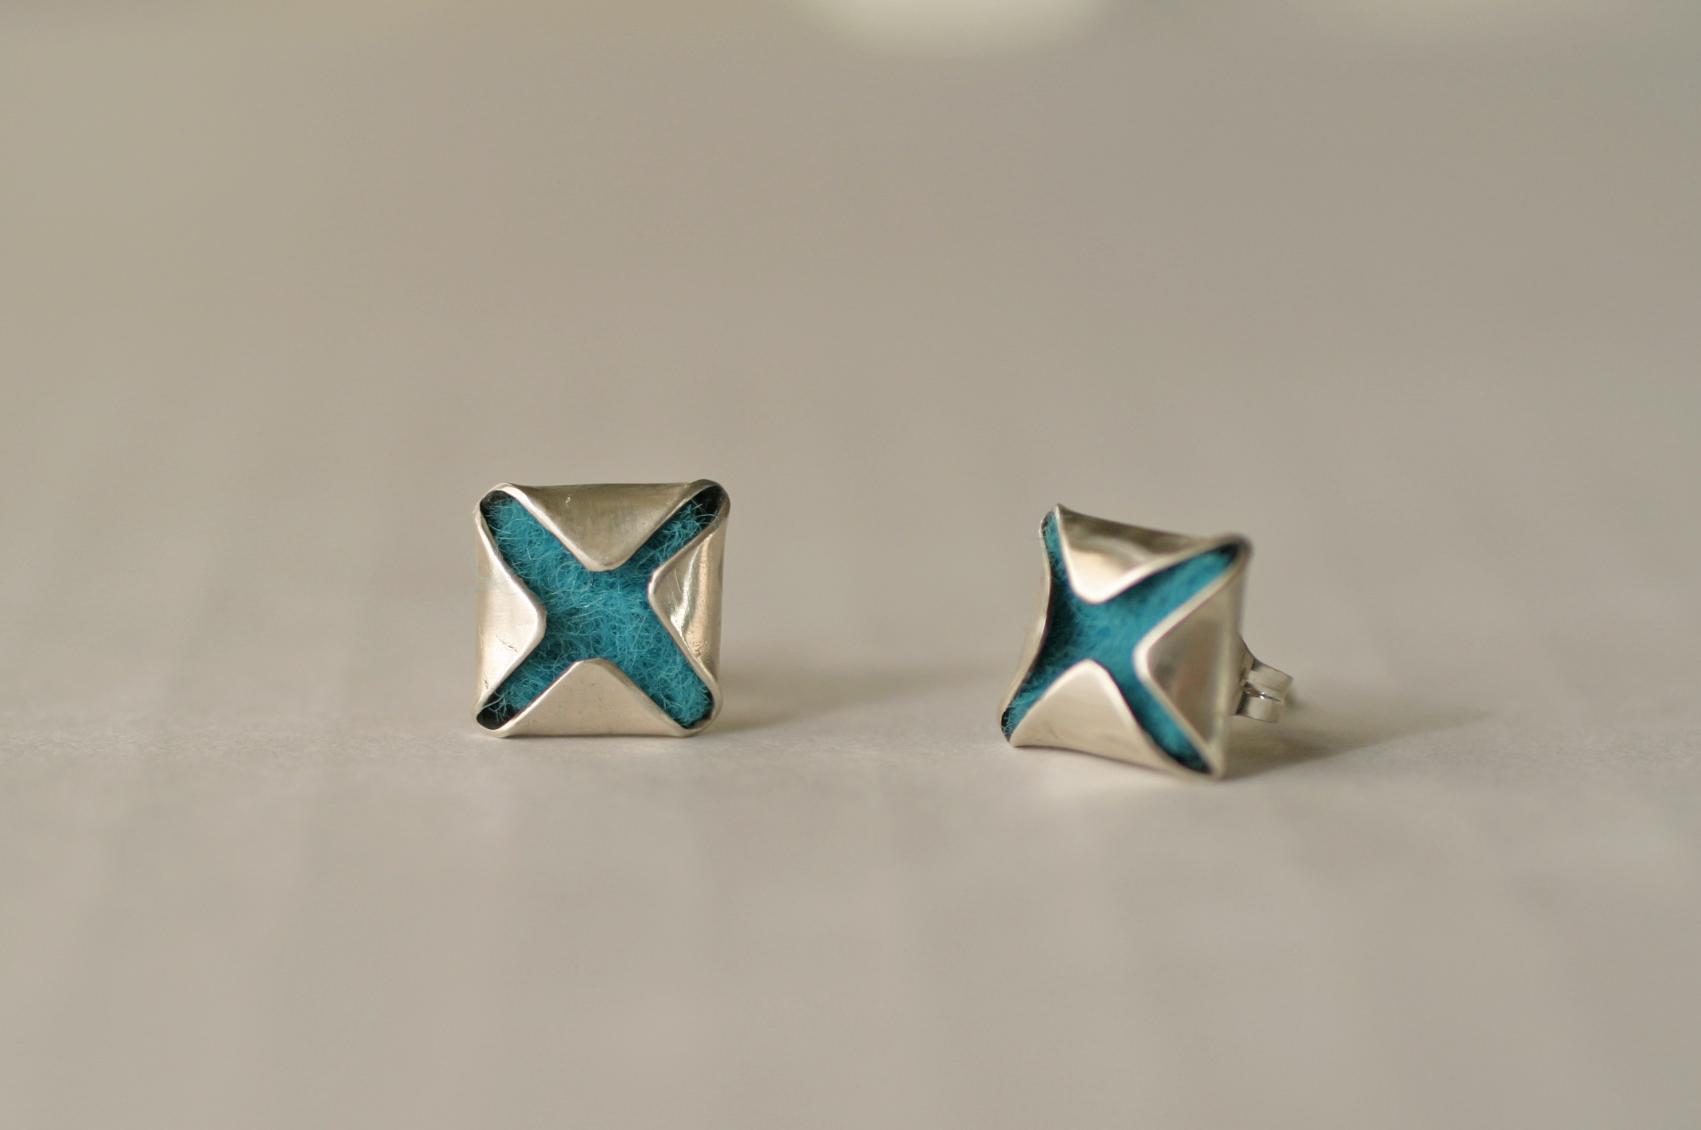 Elizabeth Baird Architecture-Jewelry-silver and felt earings.jpg